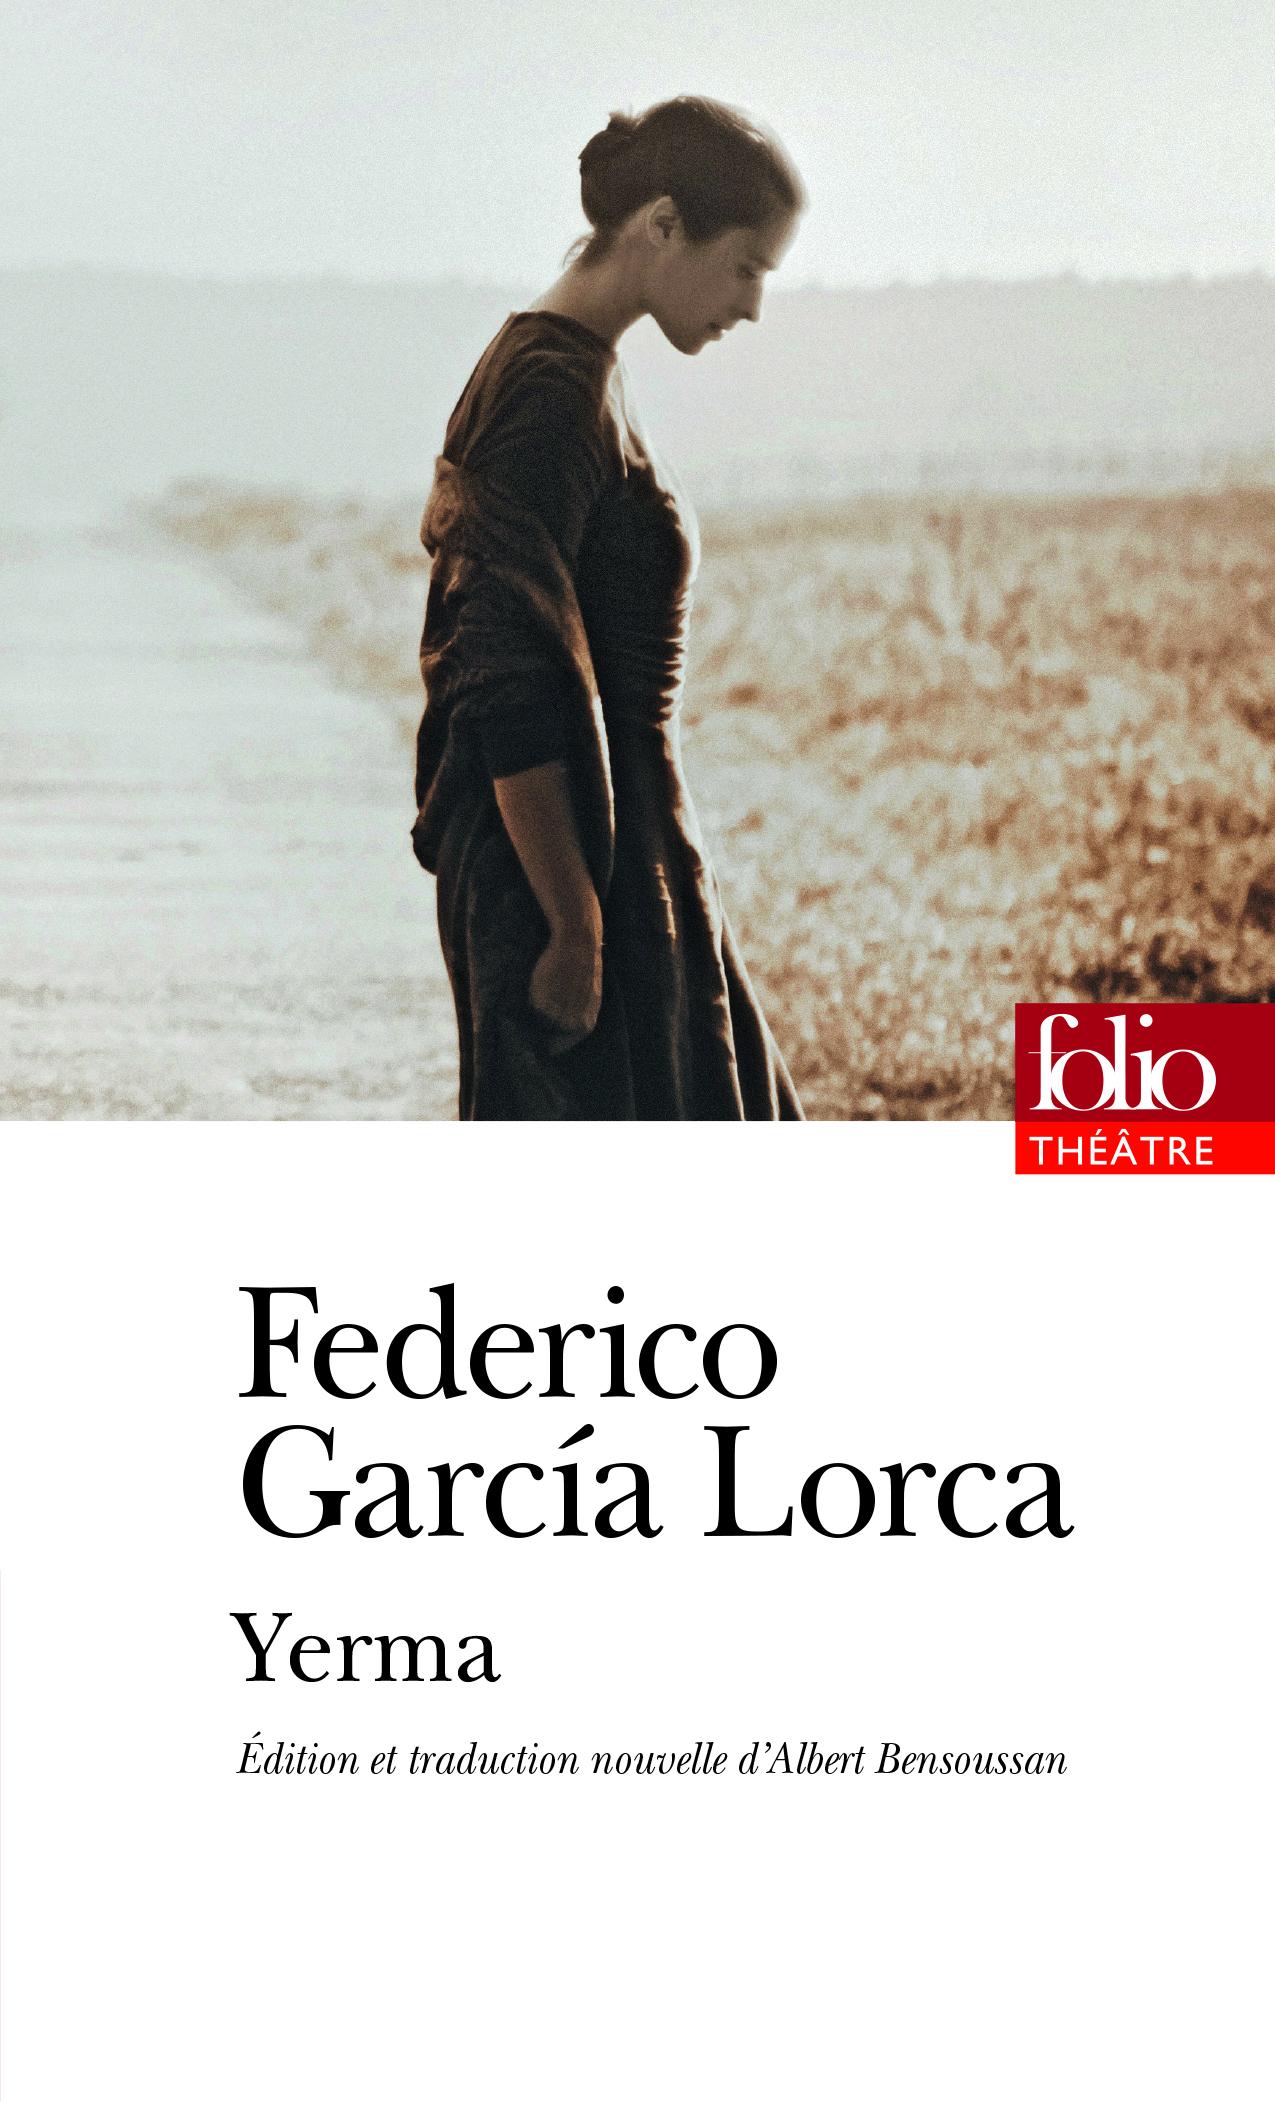 Federico García Lorca, Yerma